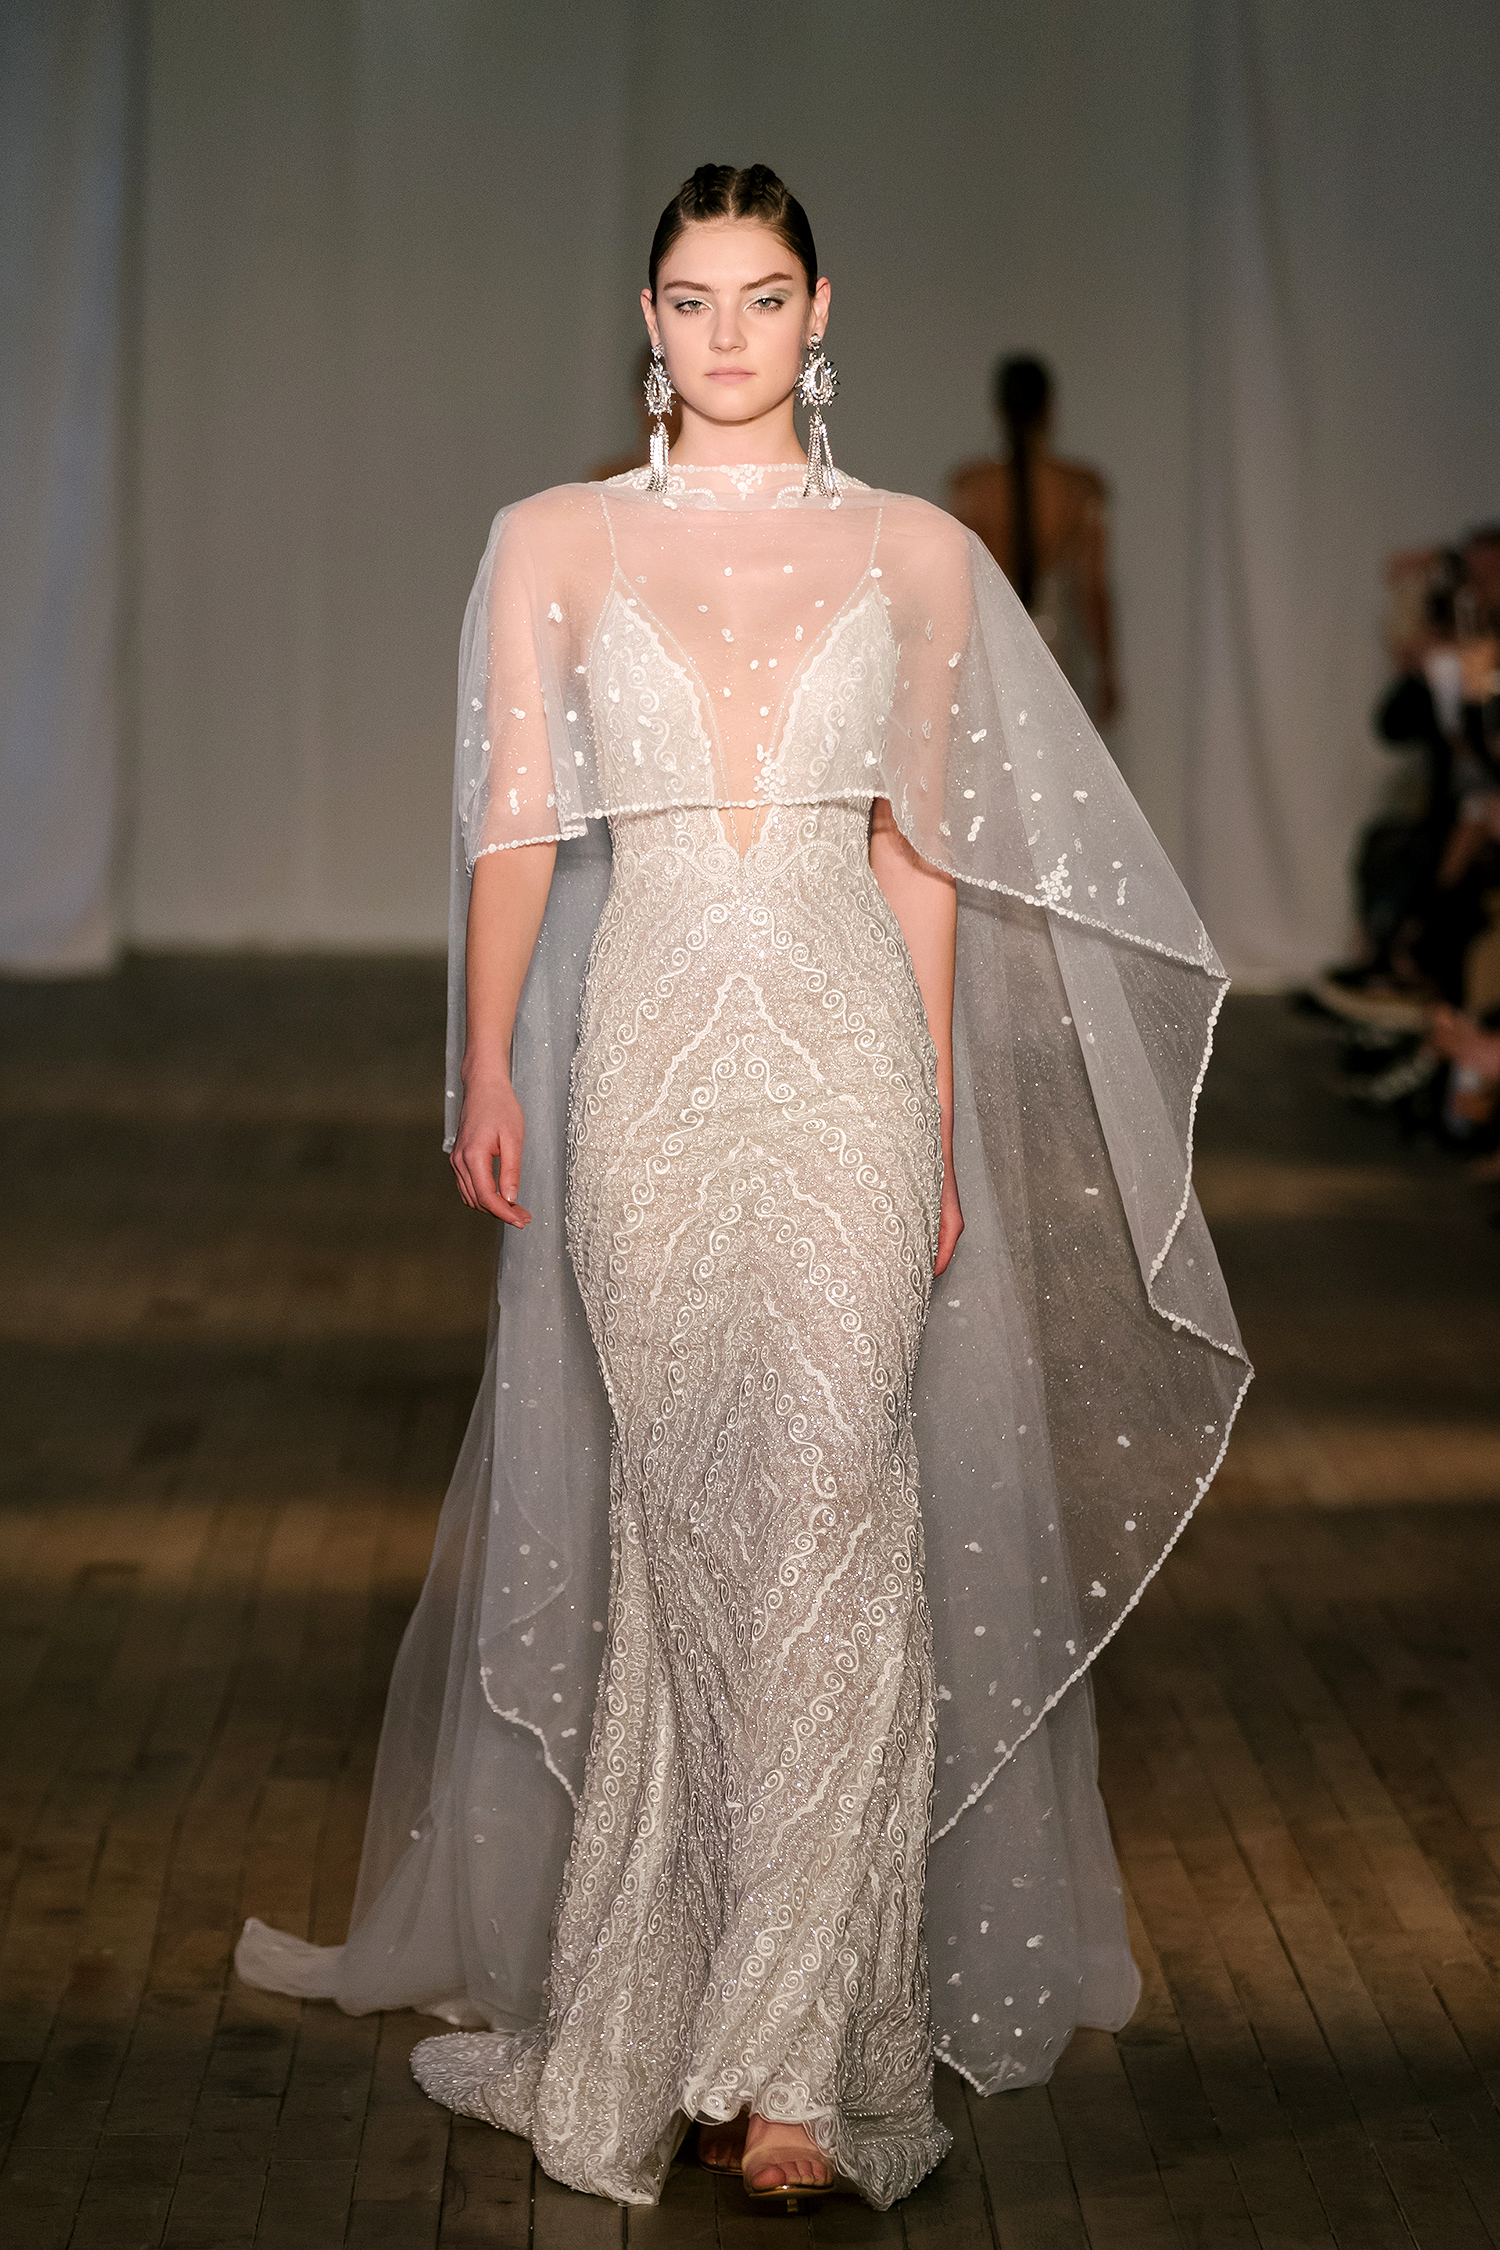 berta wedding dress spring 2019 spaghetti-strap plunging neck with cape